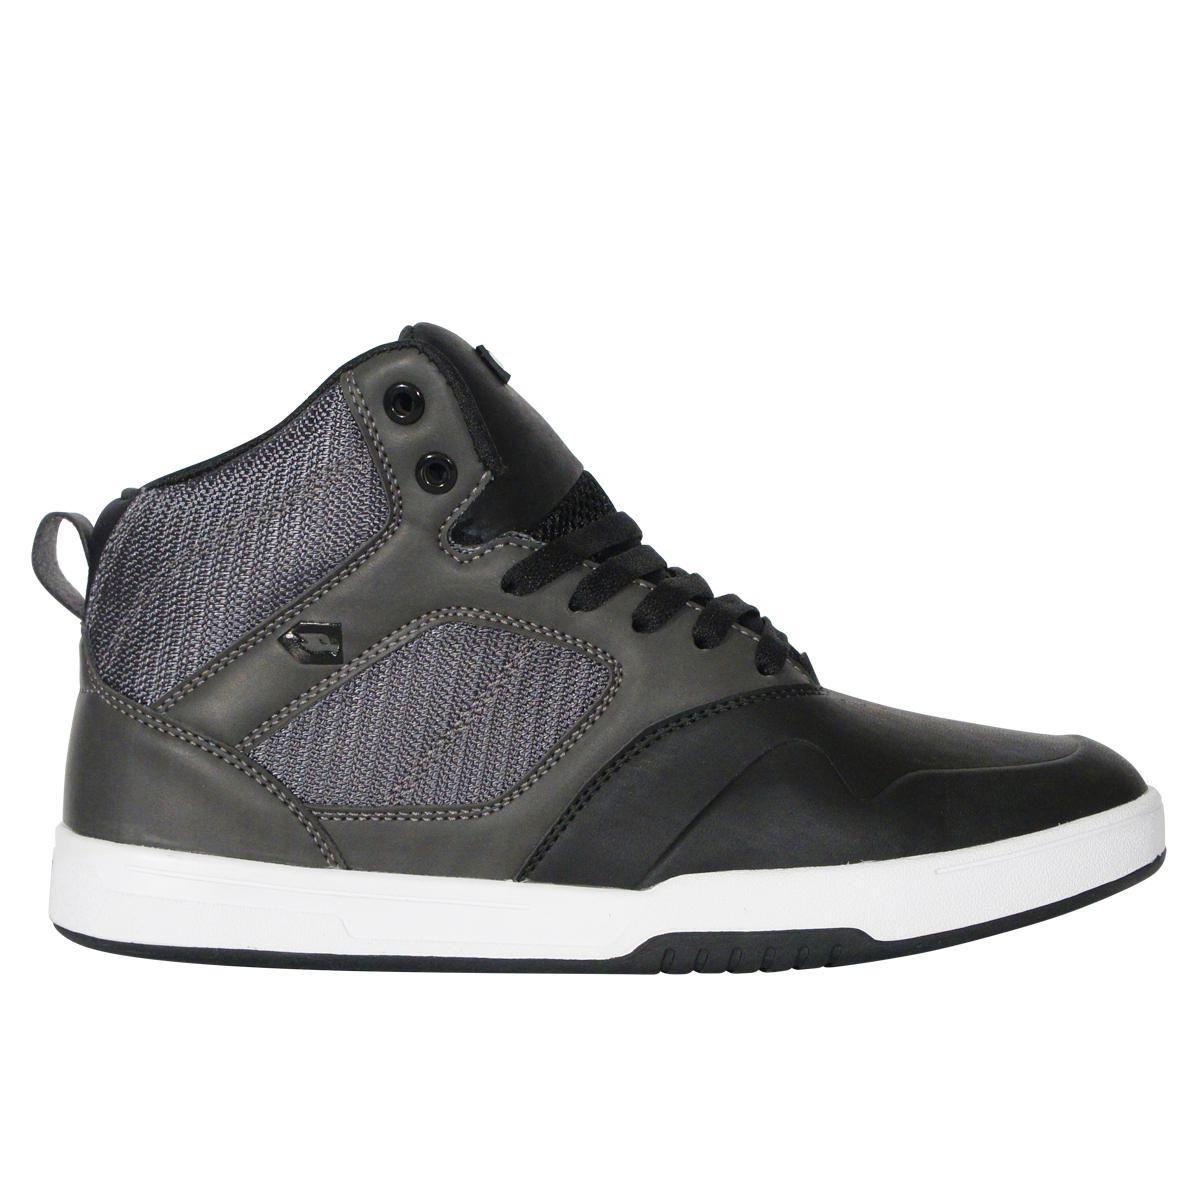 Skate shoes walmart - Skate Shoes Walmart 57